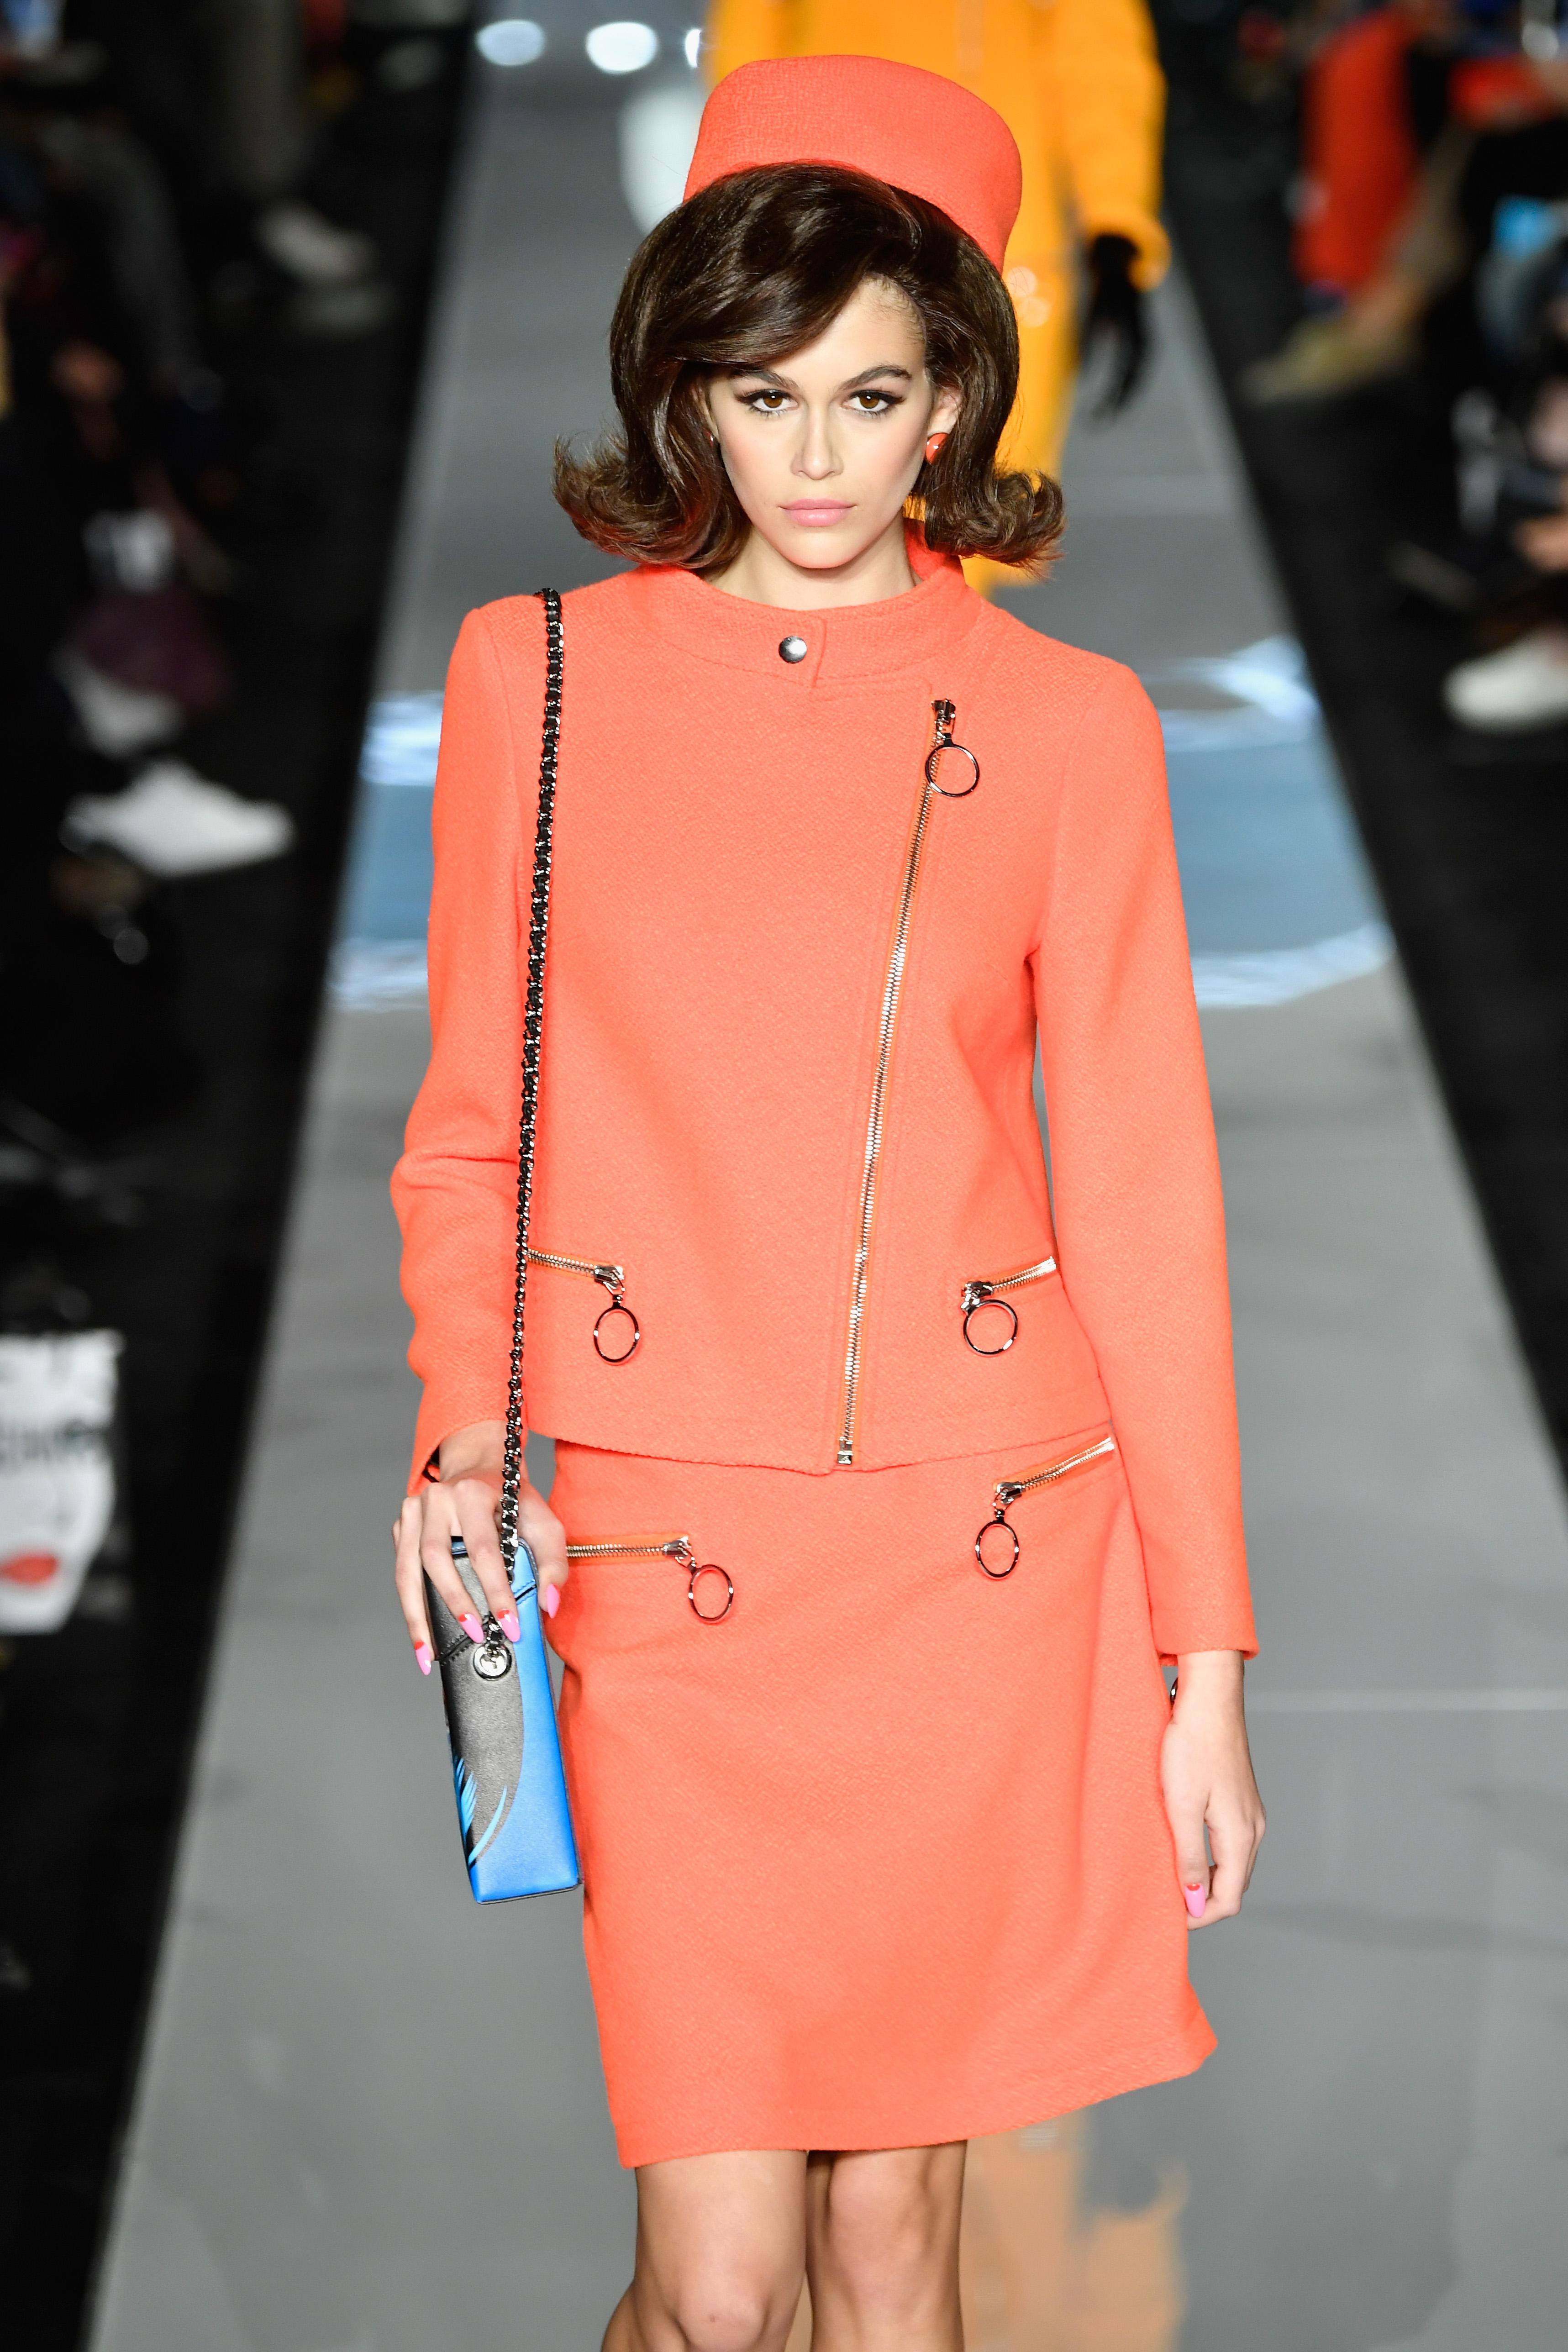 Kaia-Gerber-Gigi-Hadid-Bella-Hadid-Channel-Jackie-Kennedy-At-Milan-Fashion-Week